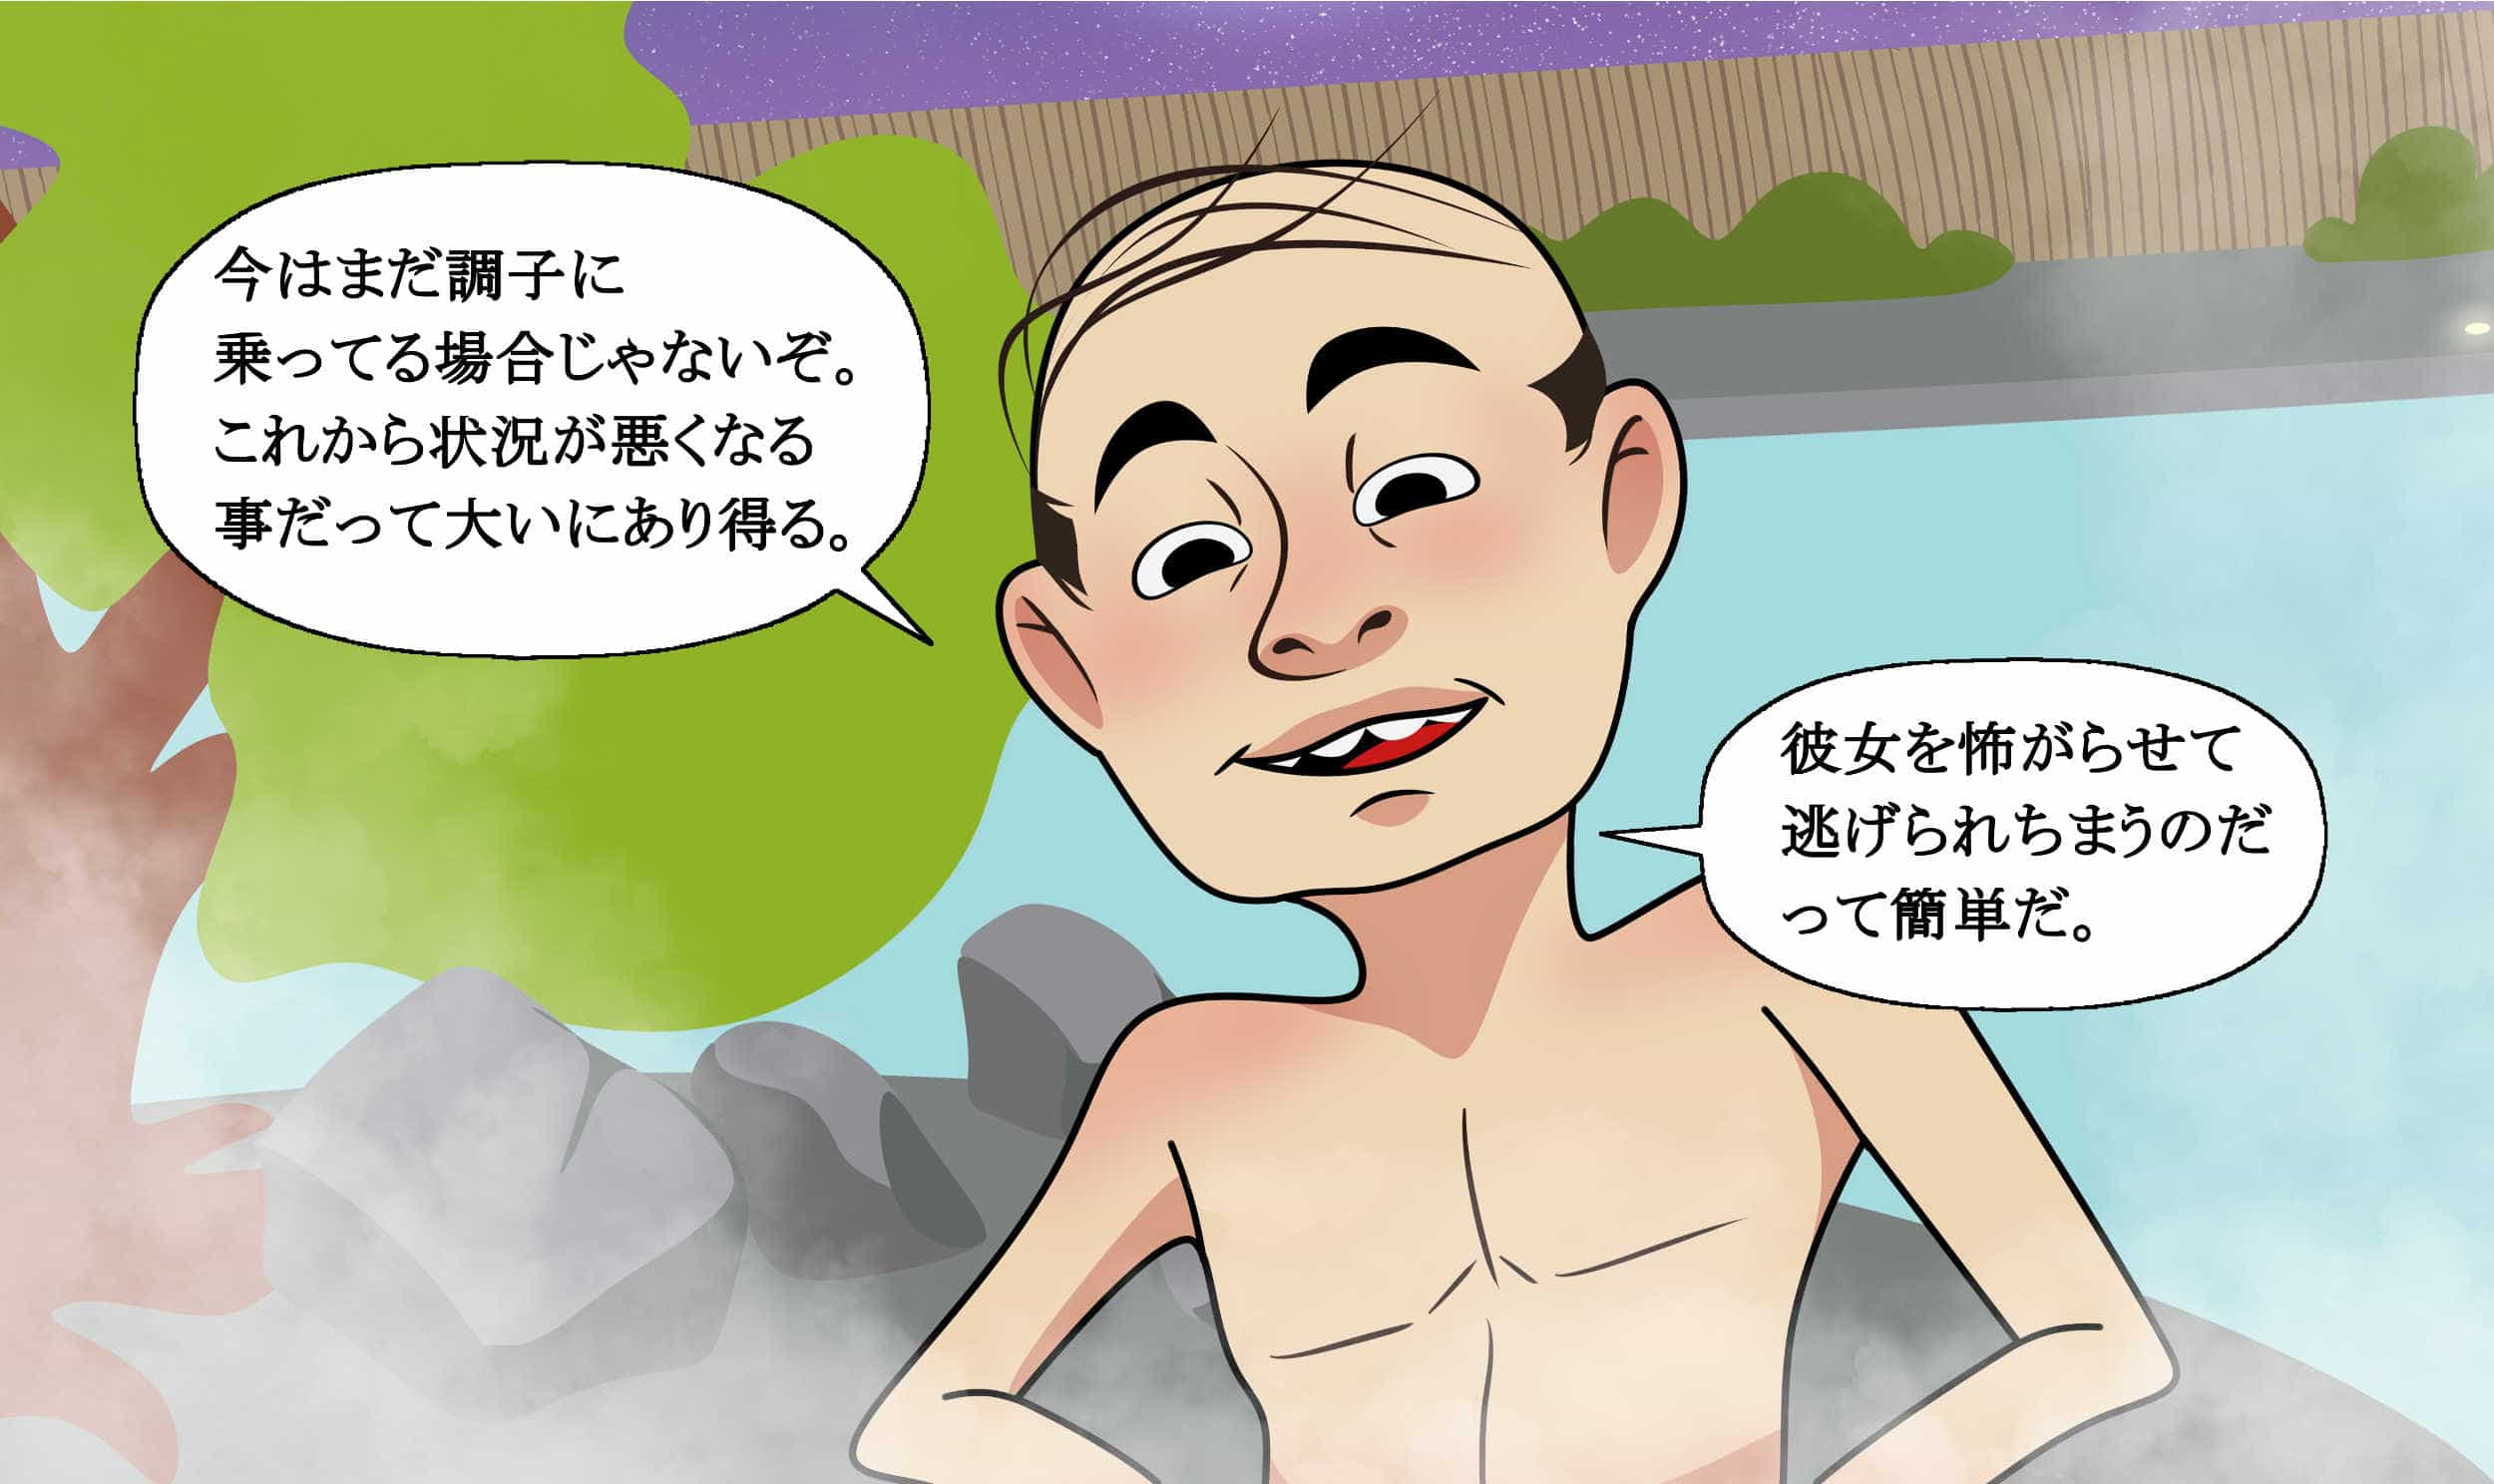 Onsen_44-1-min.jpg